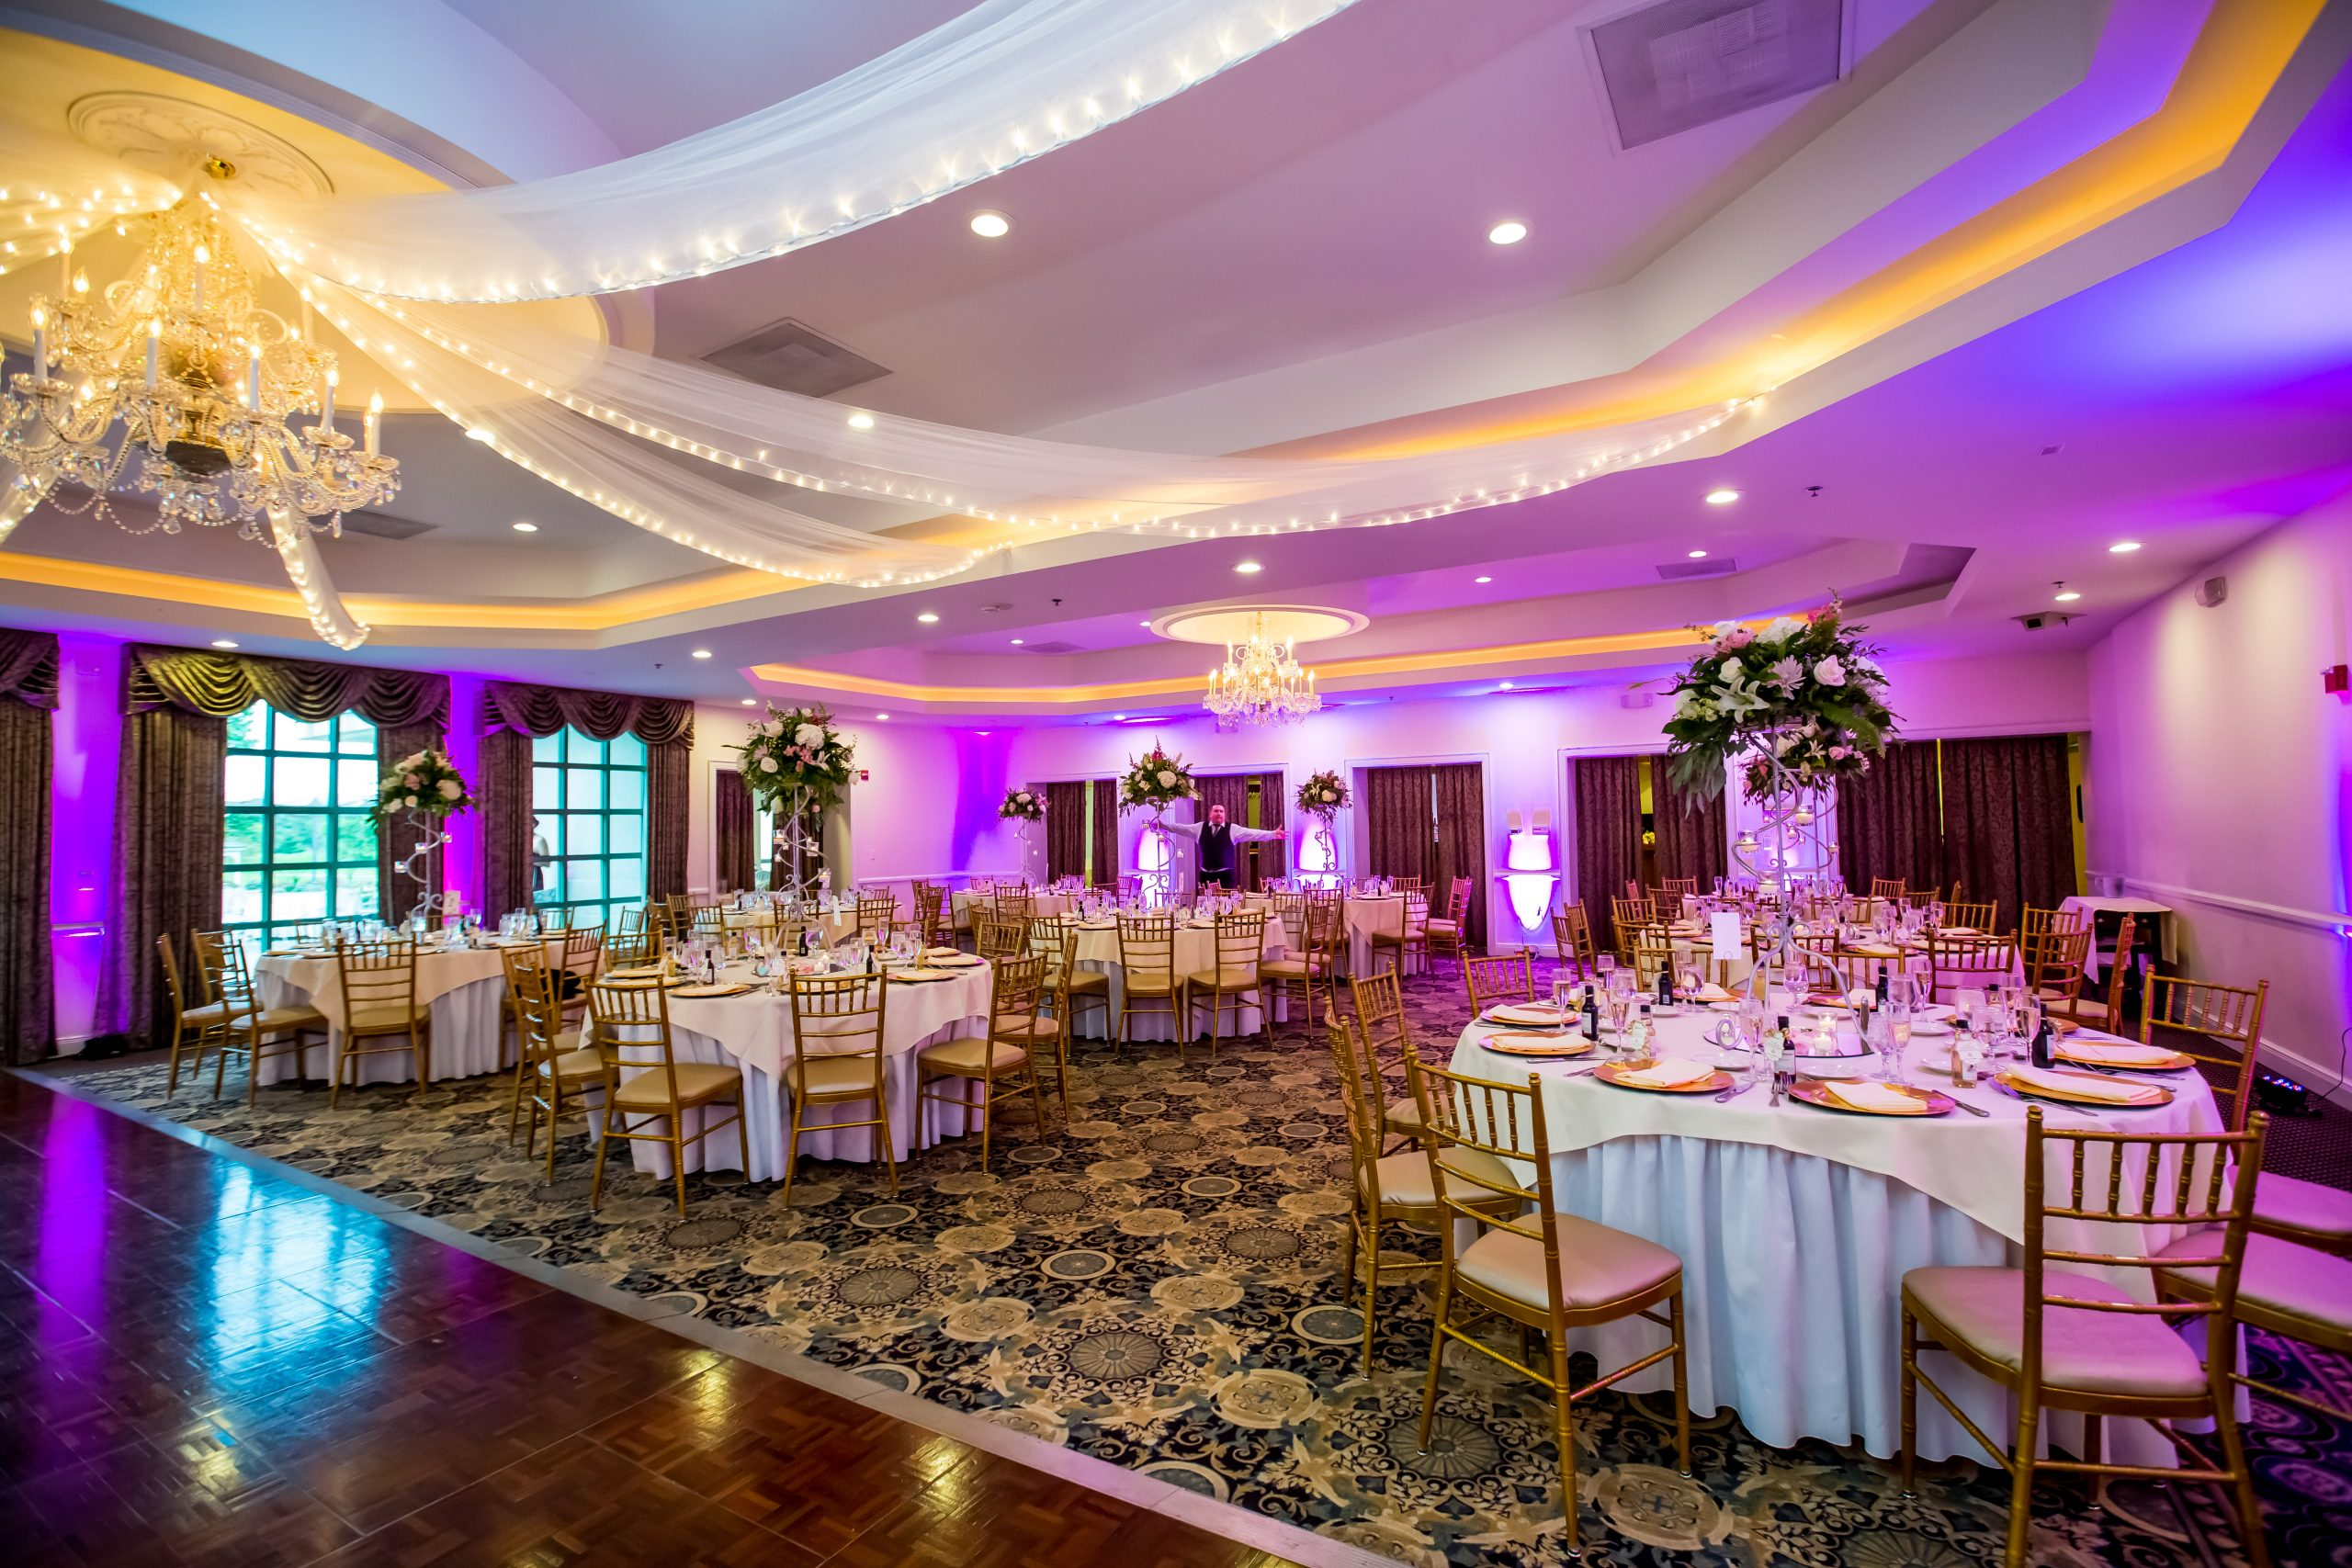 Victori_Rob_Mohawk River Country Club Wedding-45.jpg